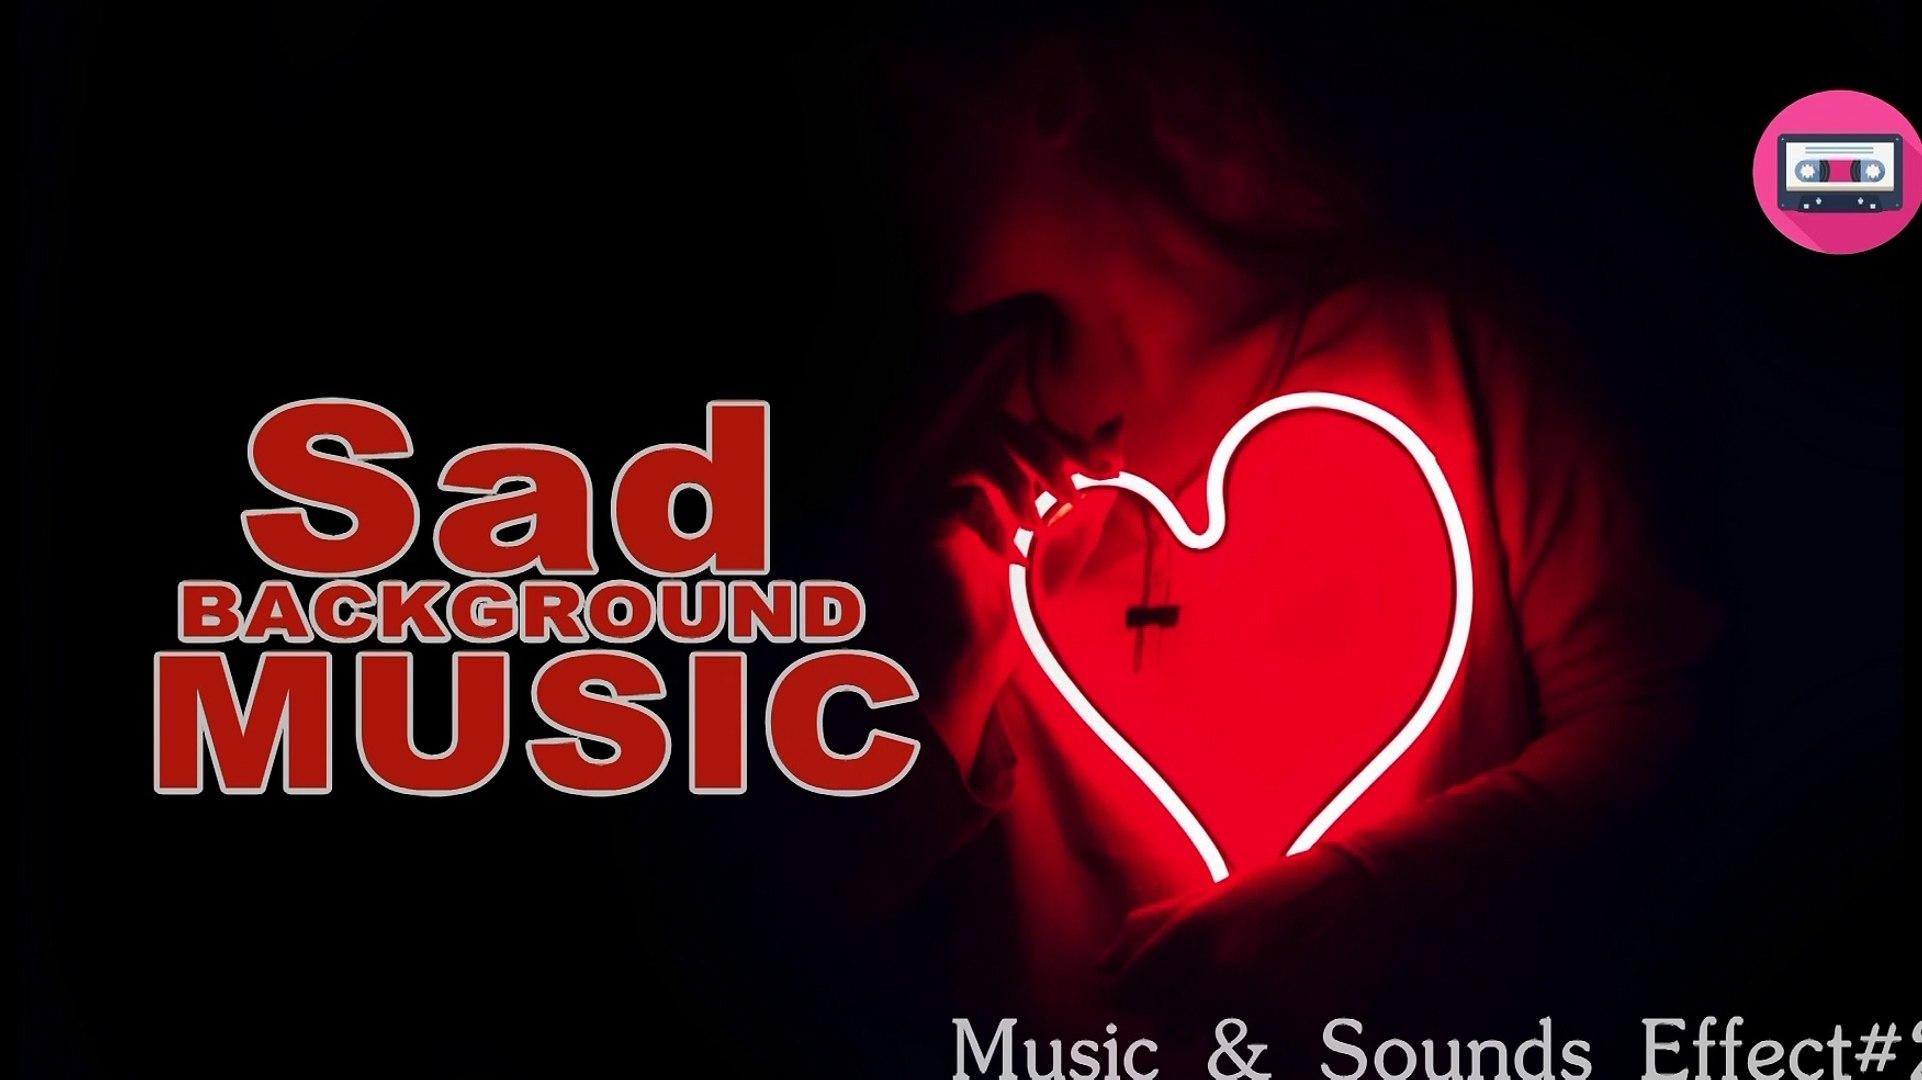 Sad Background Music 2 Cinematic No Copyright Free Music Devgadani Video Dailymotion